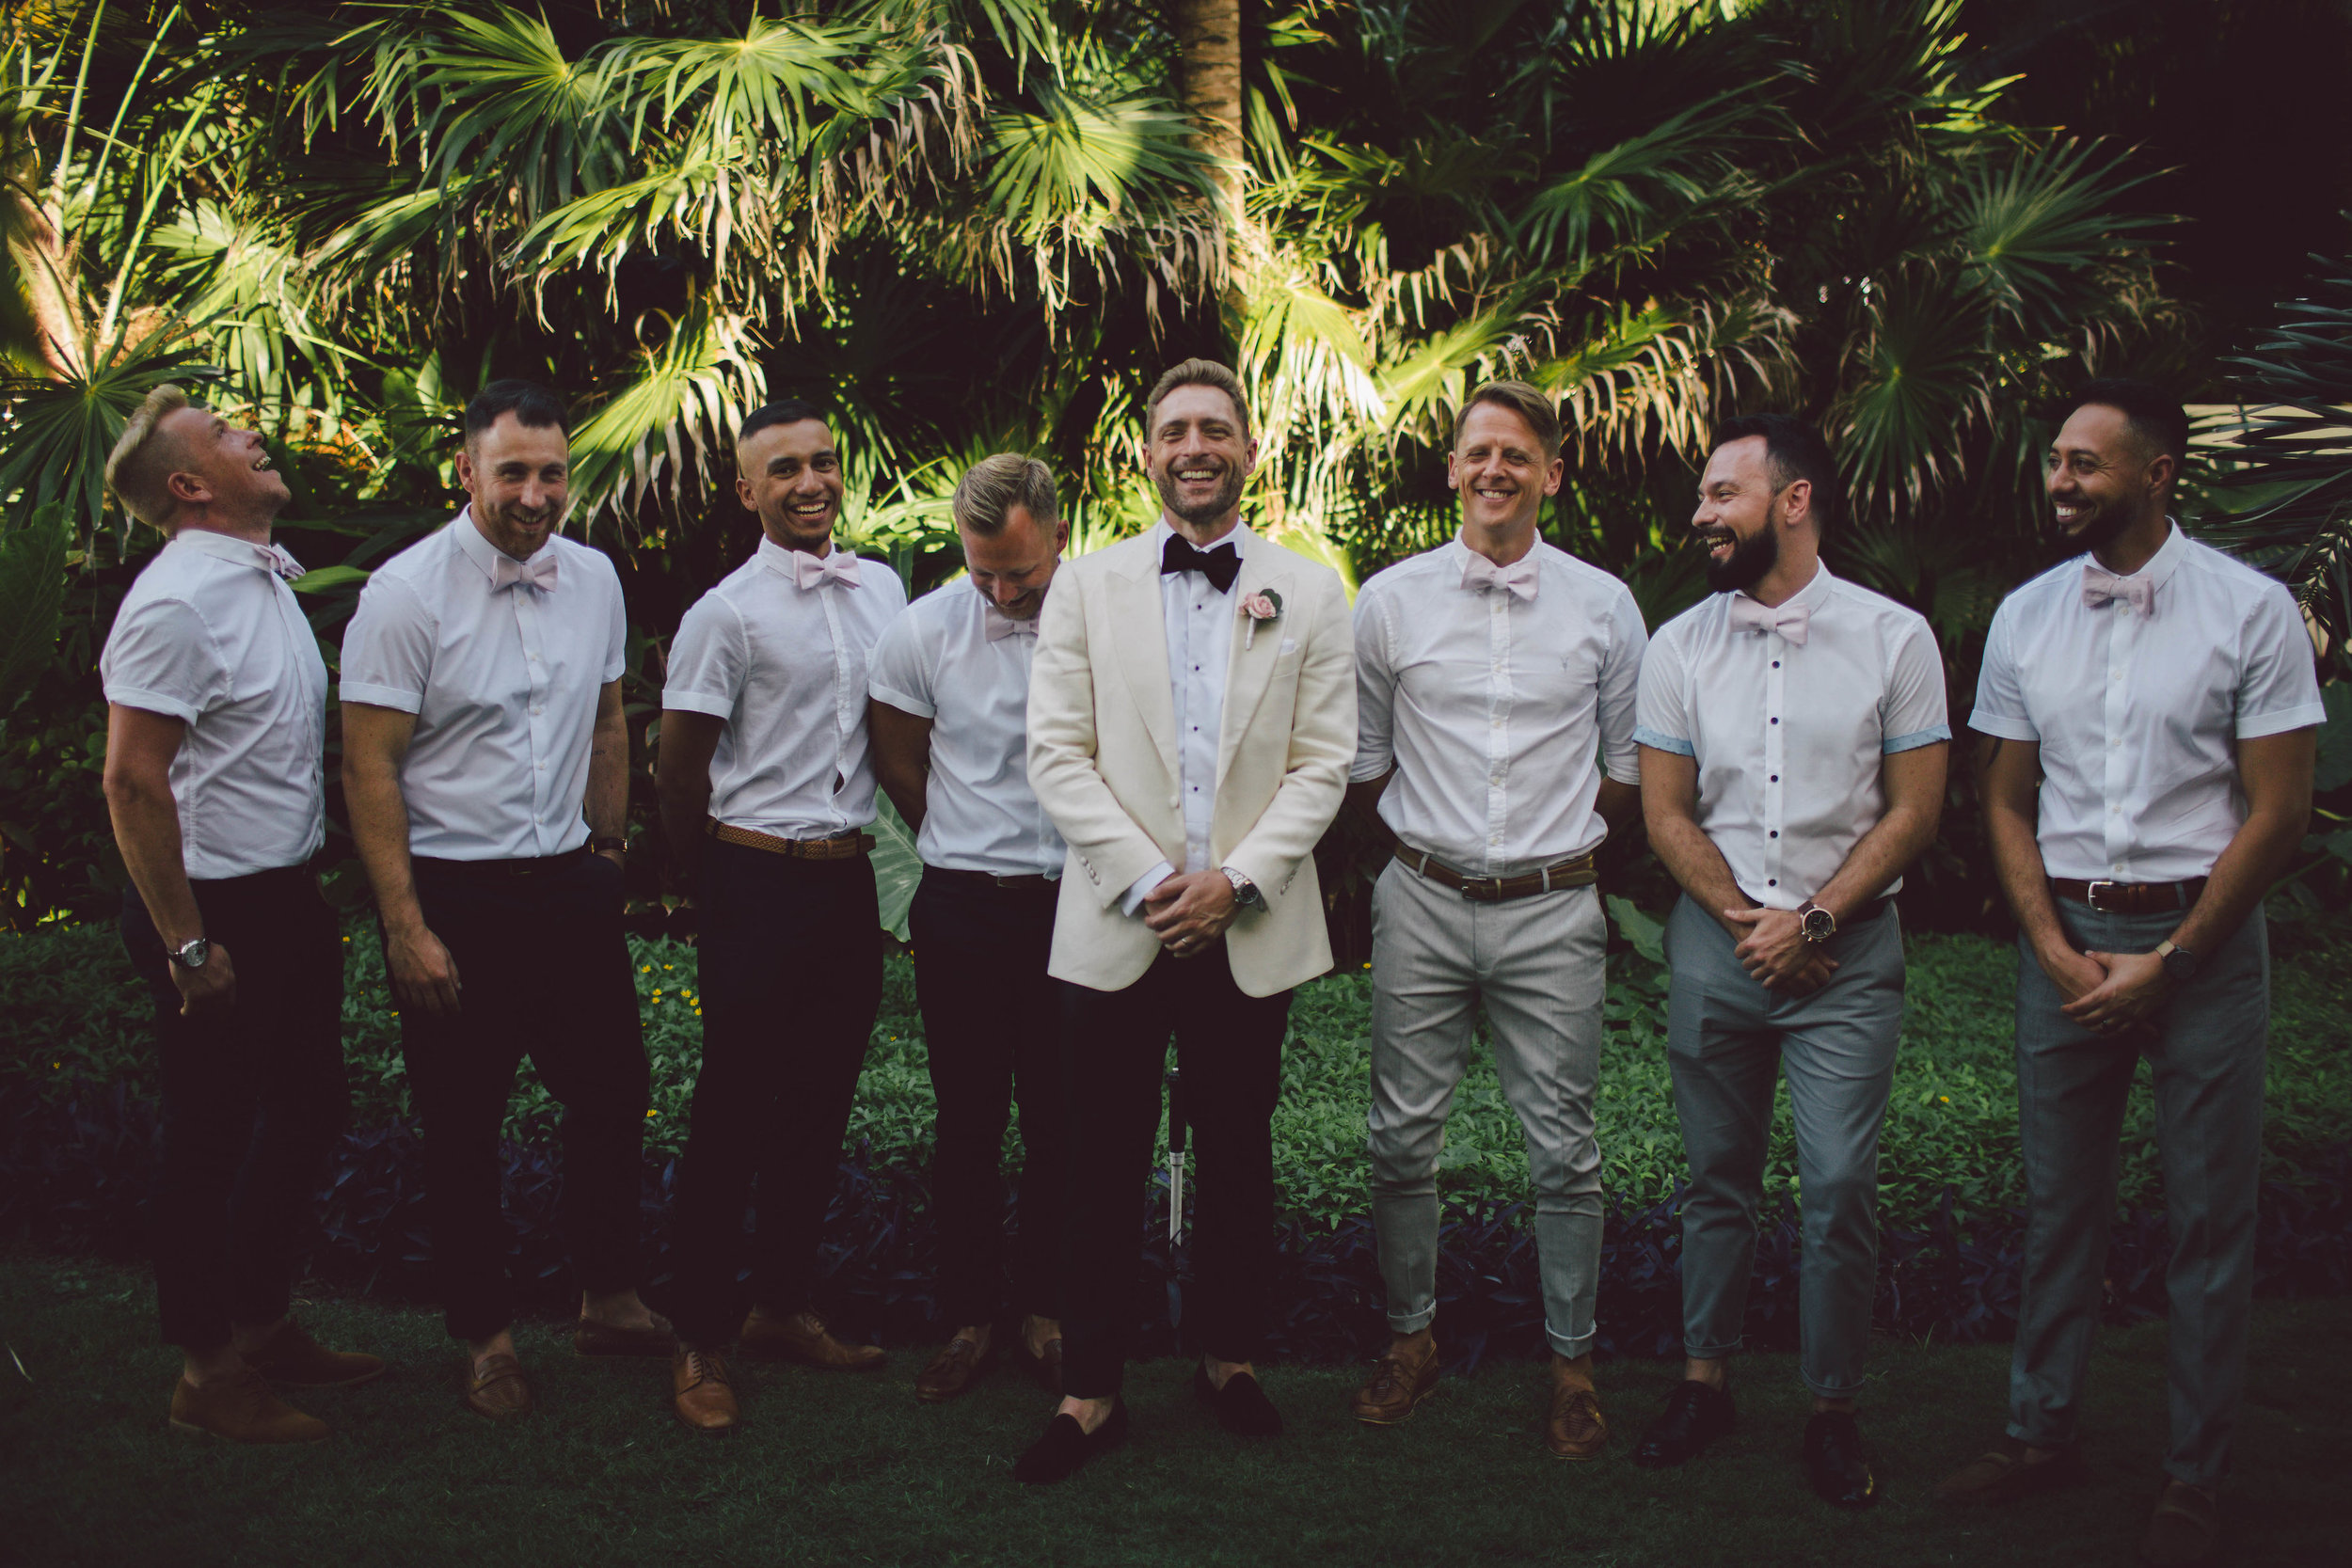 mexico_wedding_cancun_villa_la_joya_evangeline_lane_077.jpg